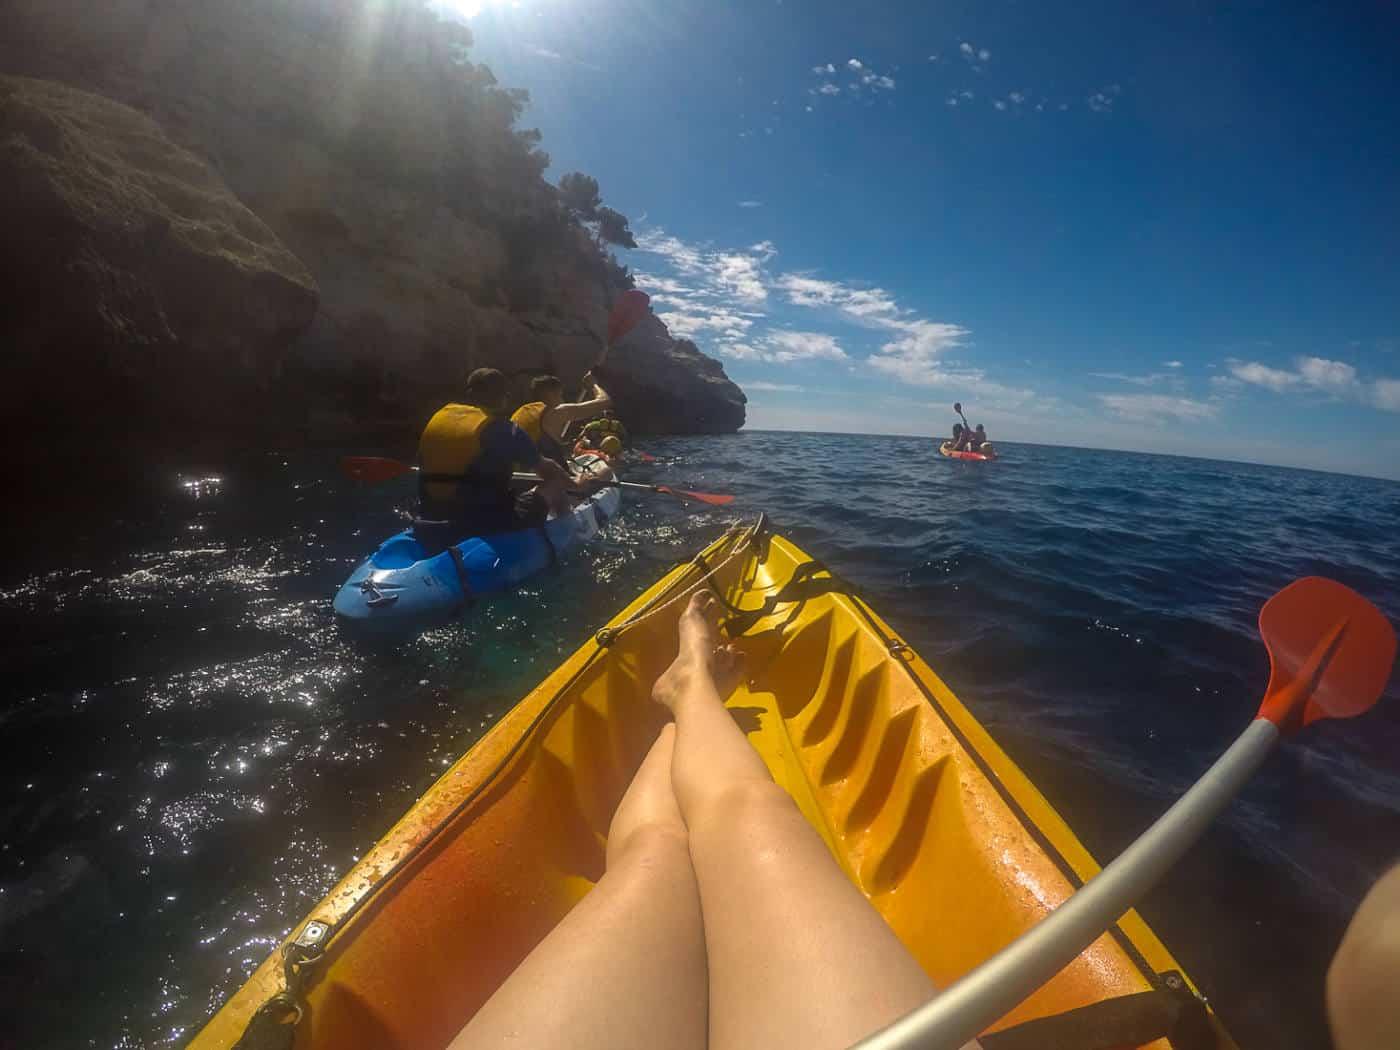 Kayaking in Cala Galdana